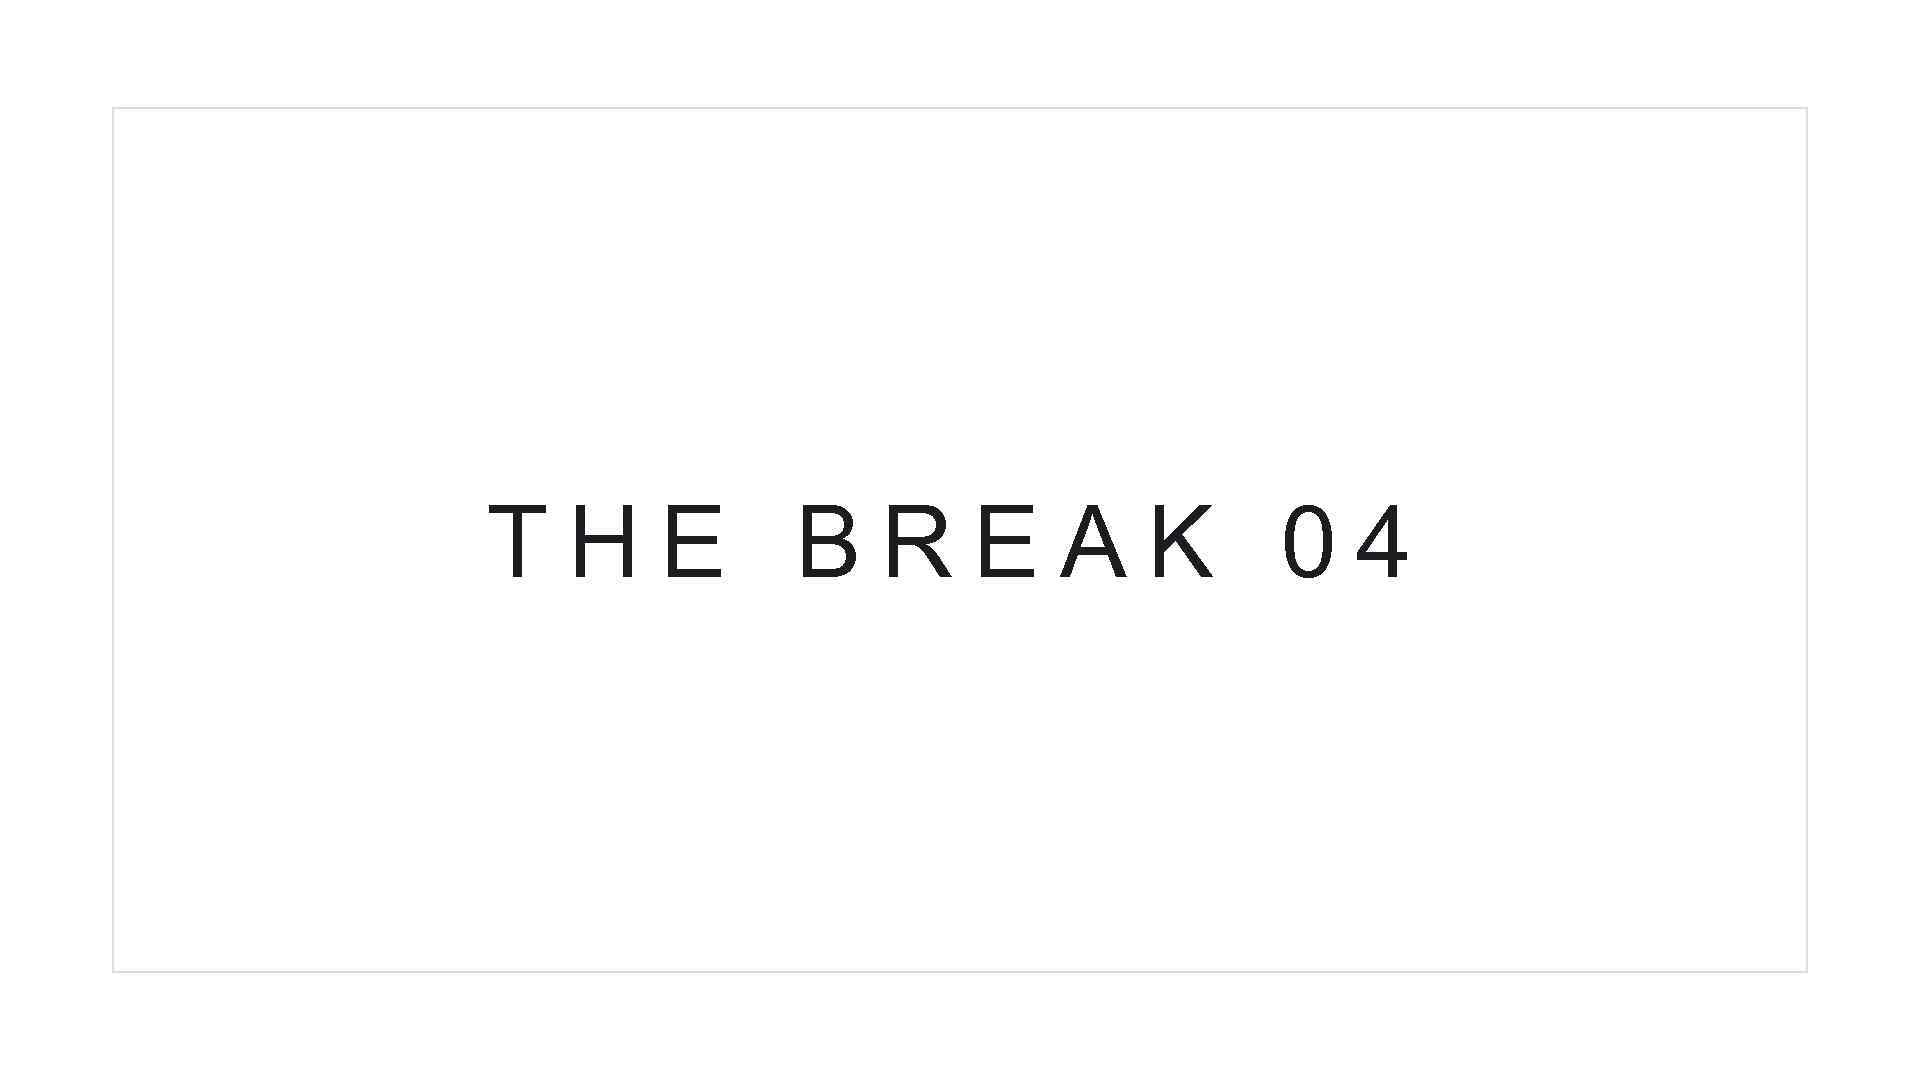 THE BREAK 04